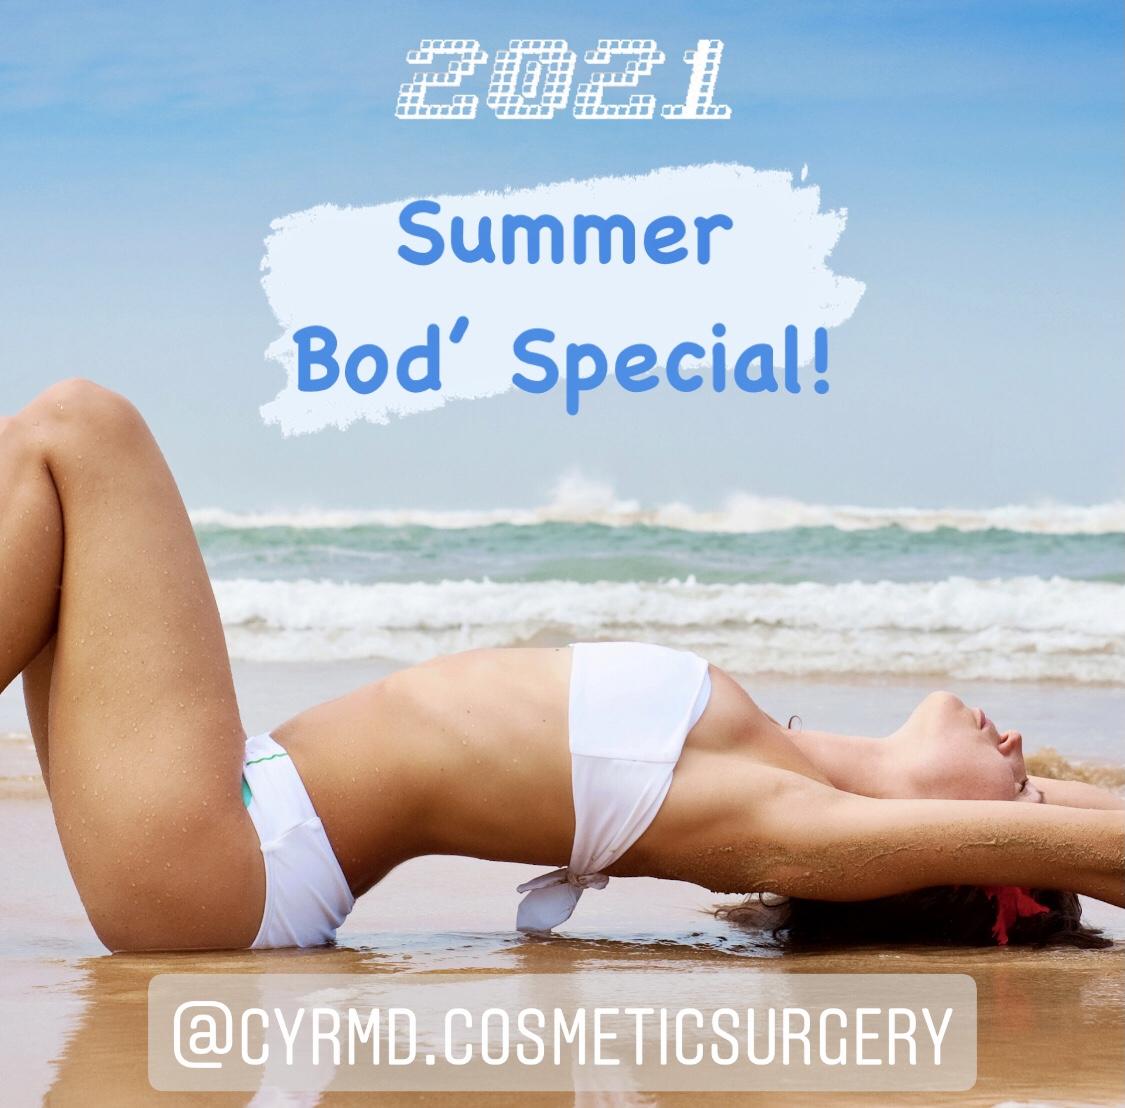 Summer Bod' Special!